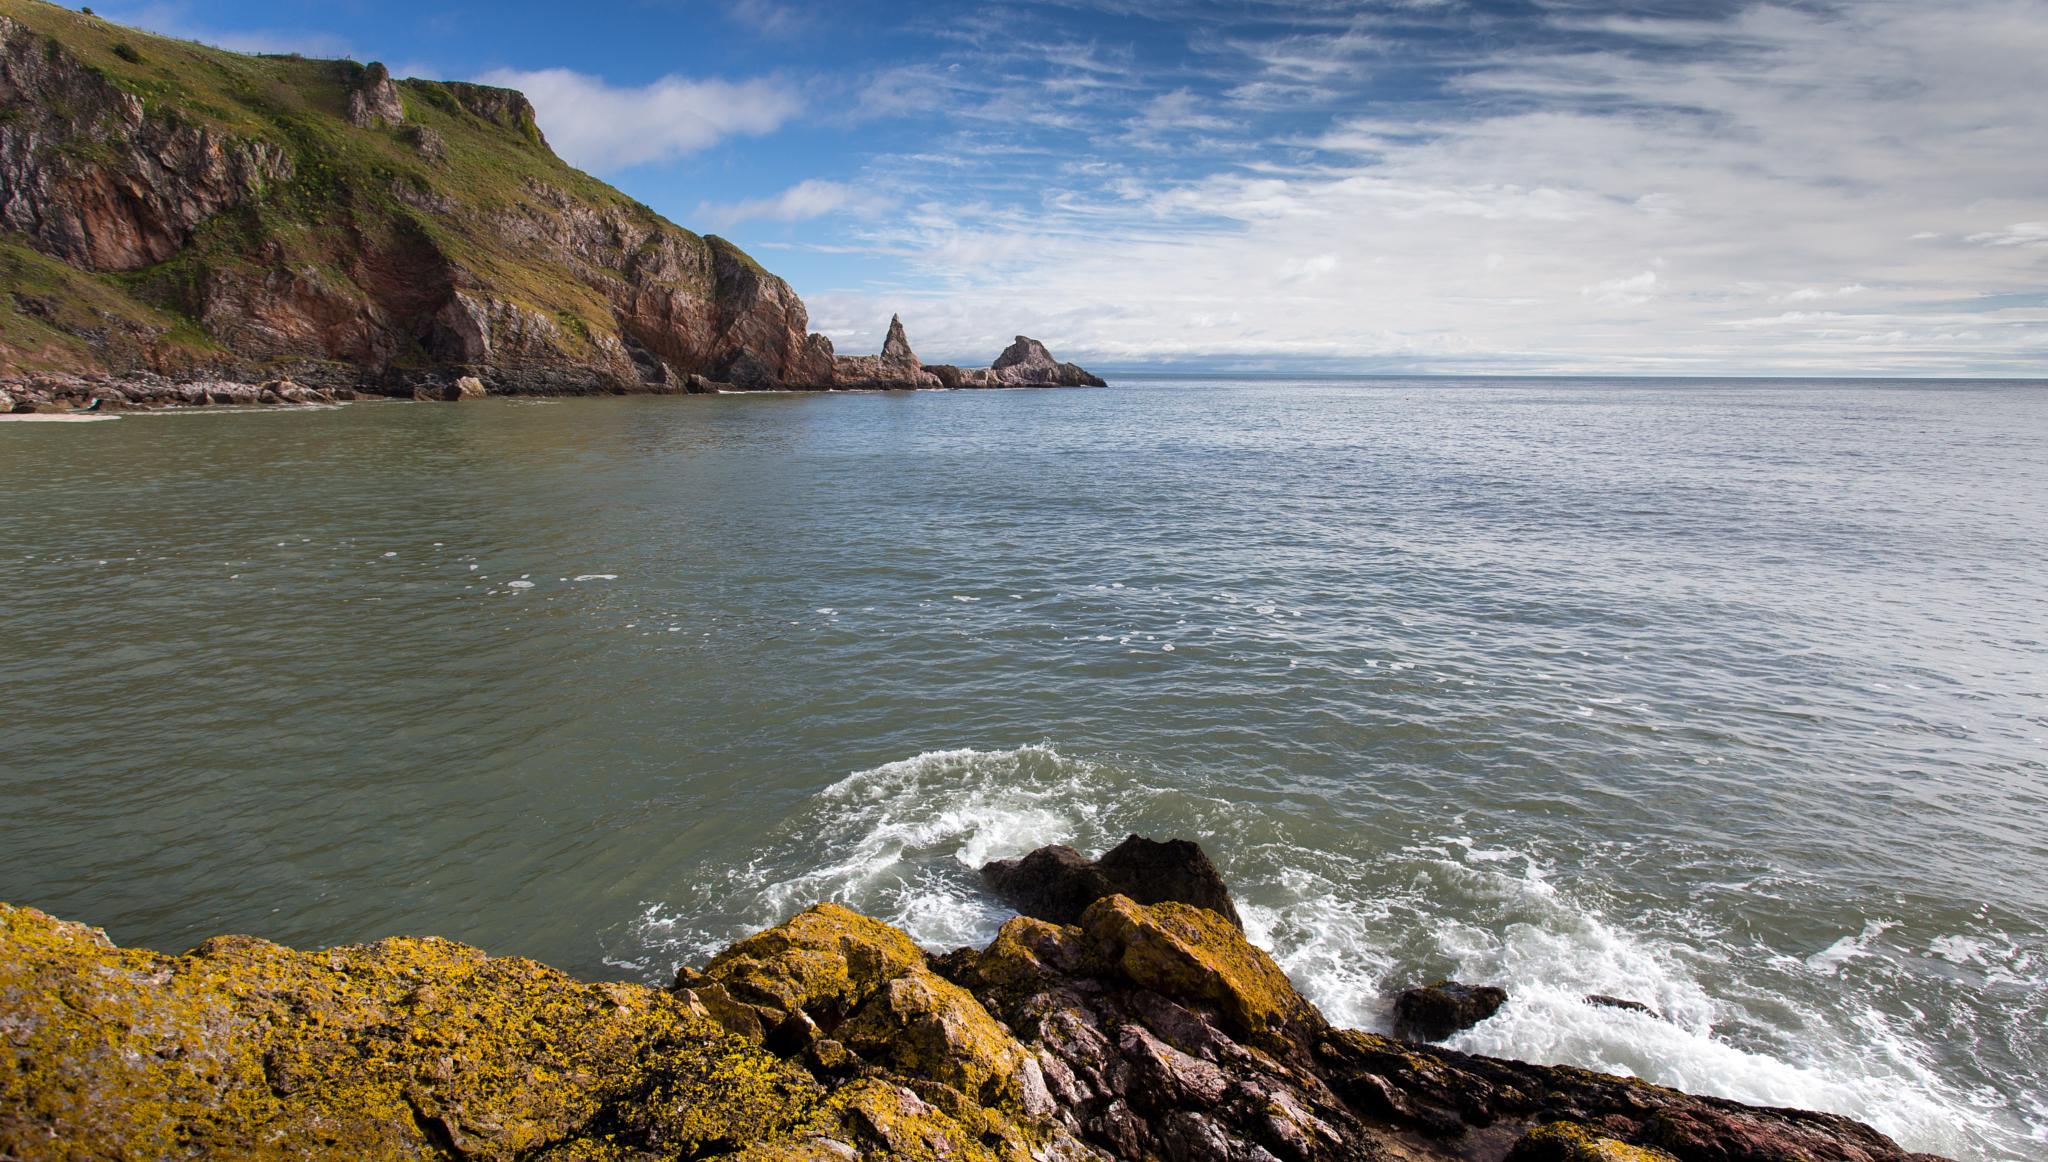 Anstey's Cove - Torquay by messedupmojo